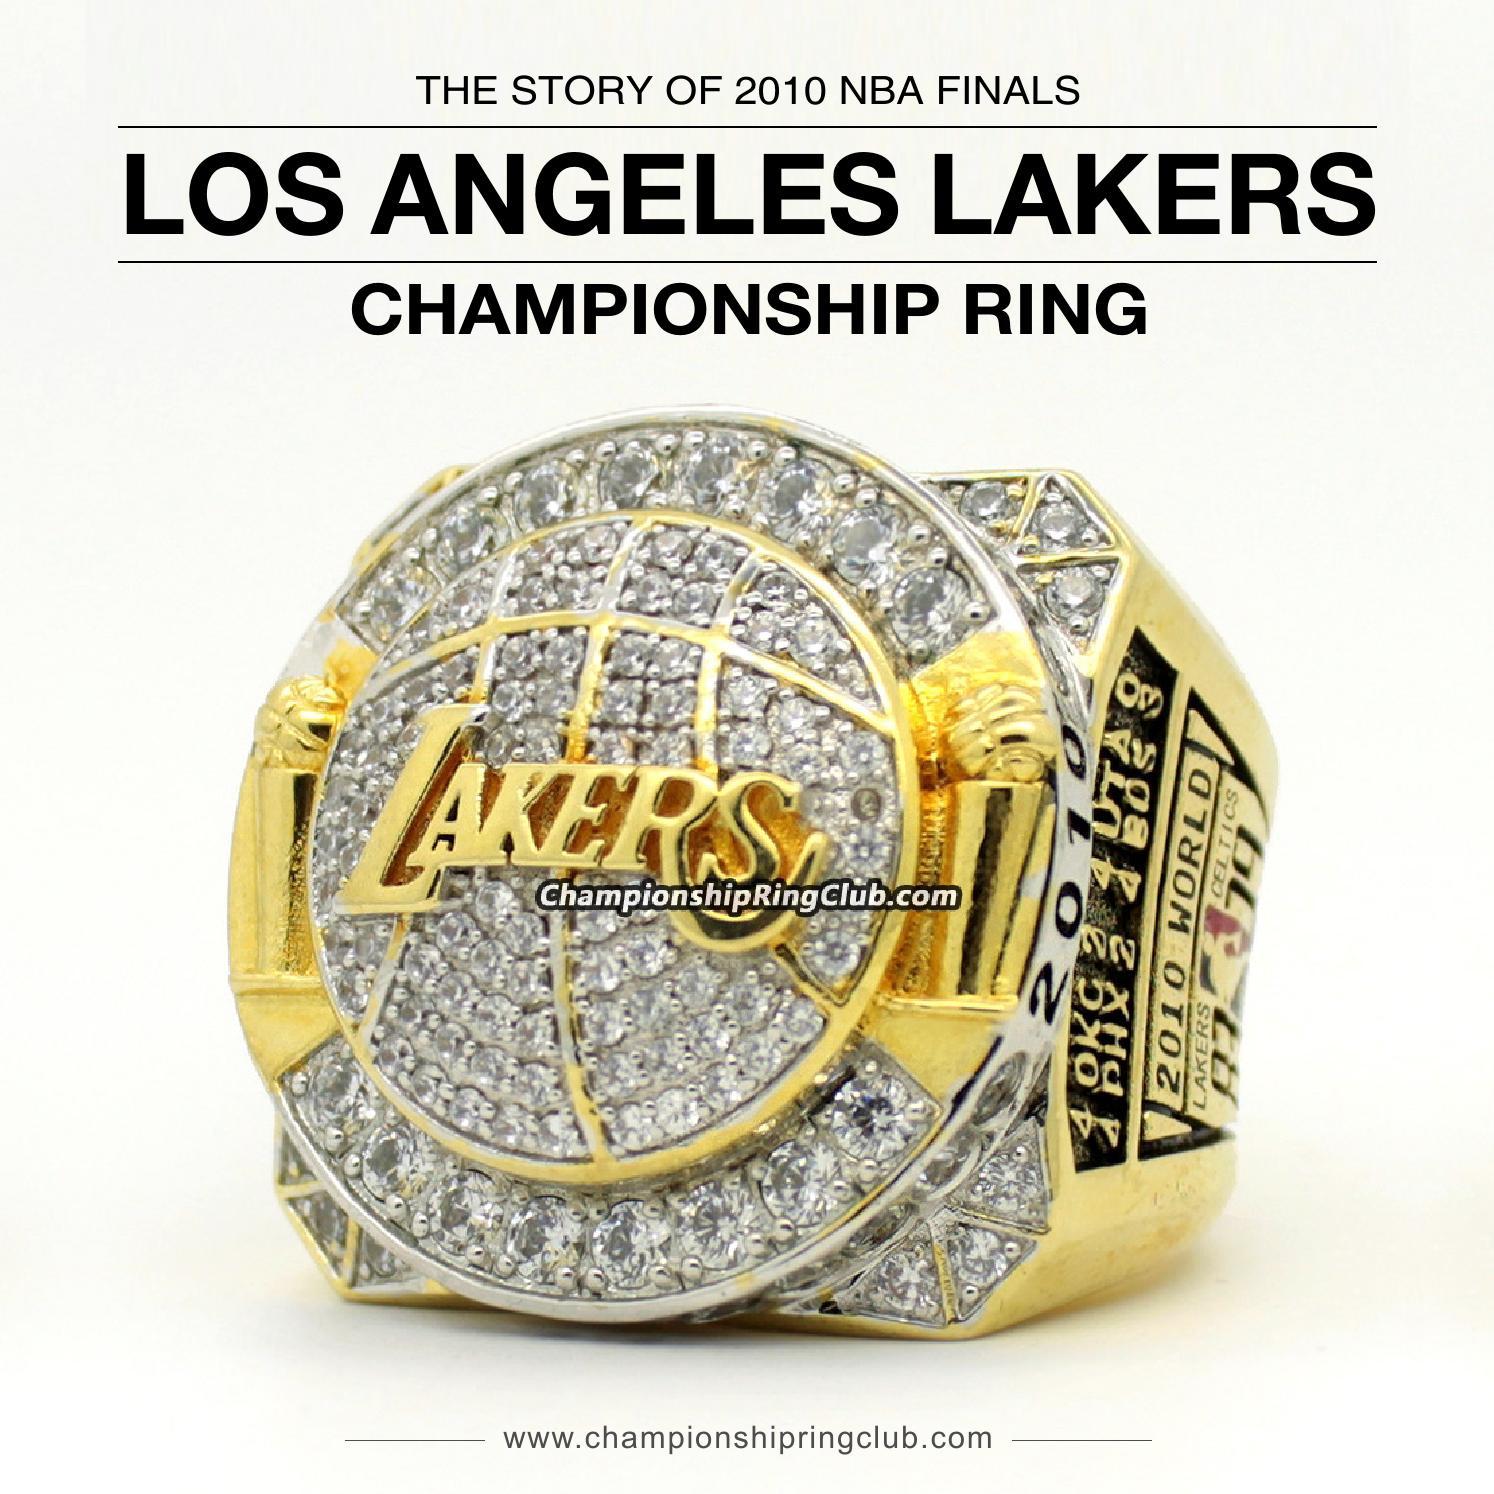 2010 Los Angeles Lakers Nba Championship Ring By Championshipringclub Issuu